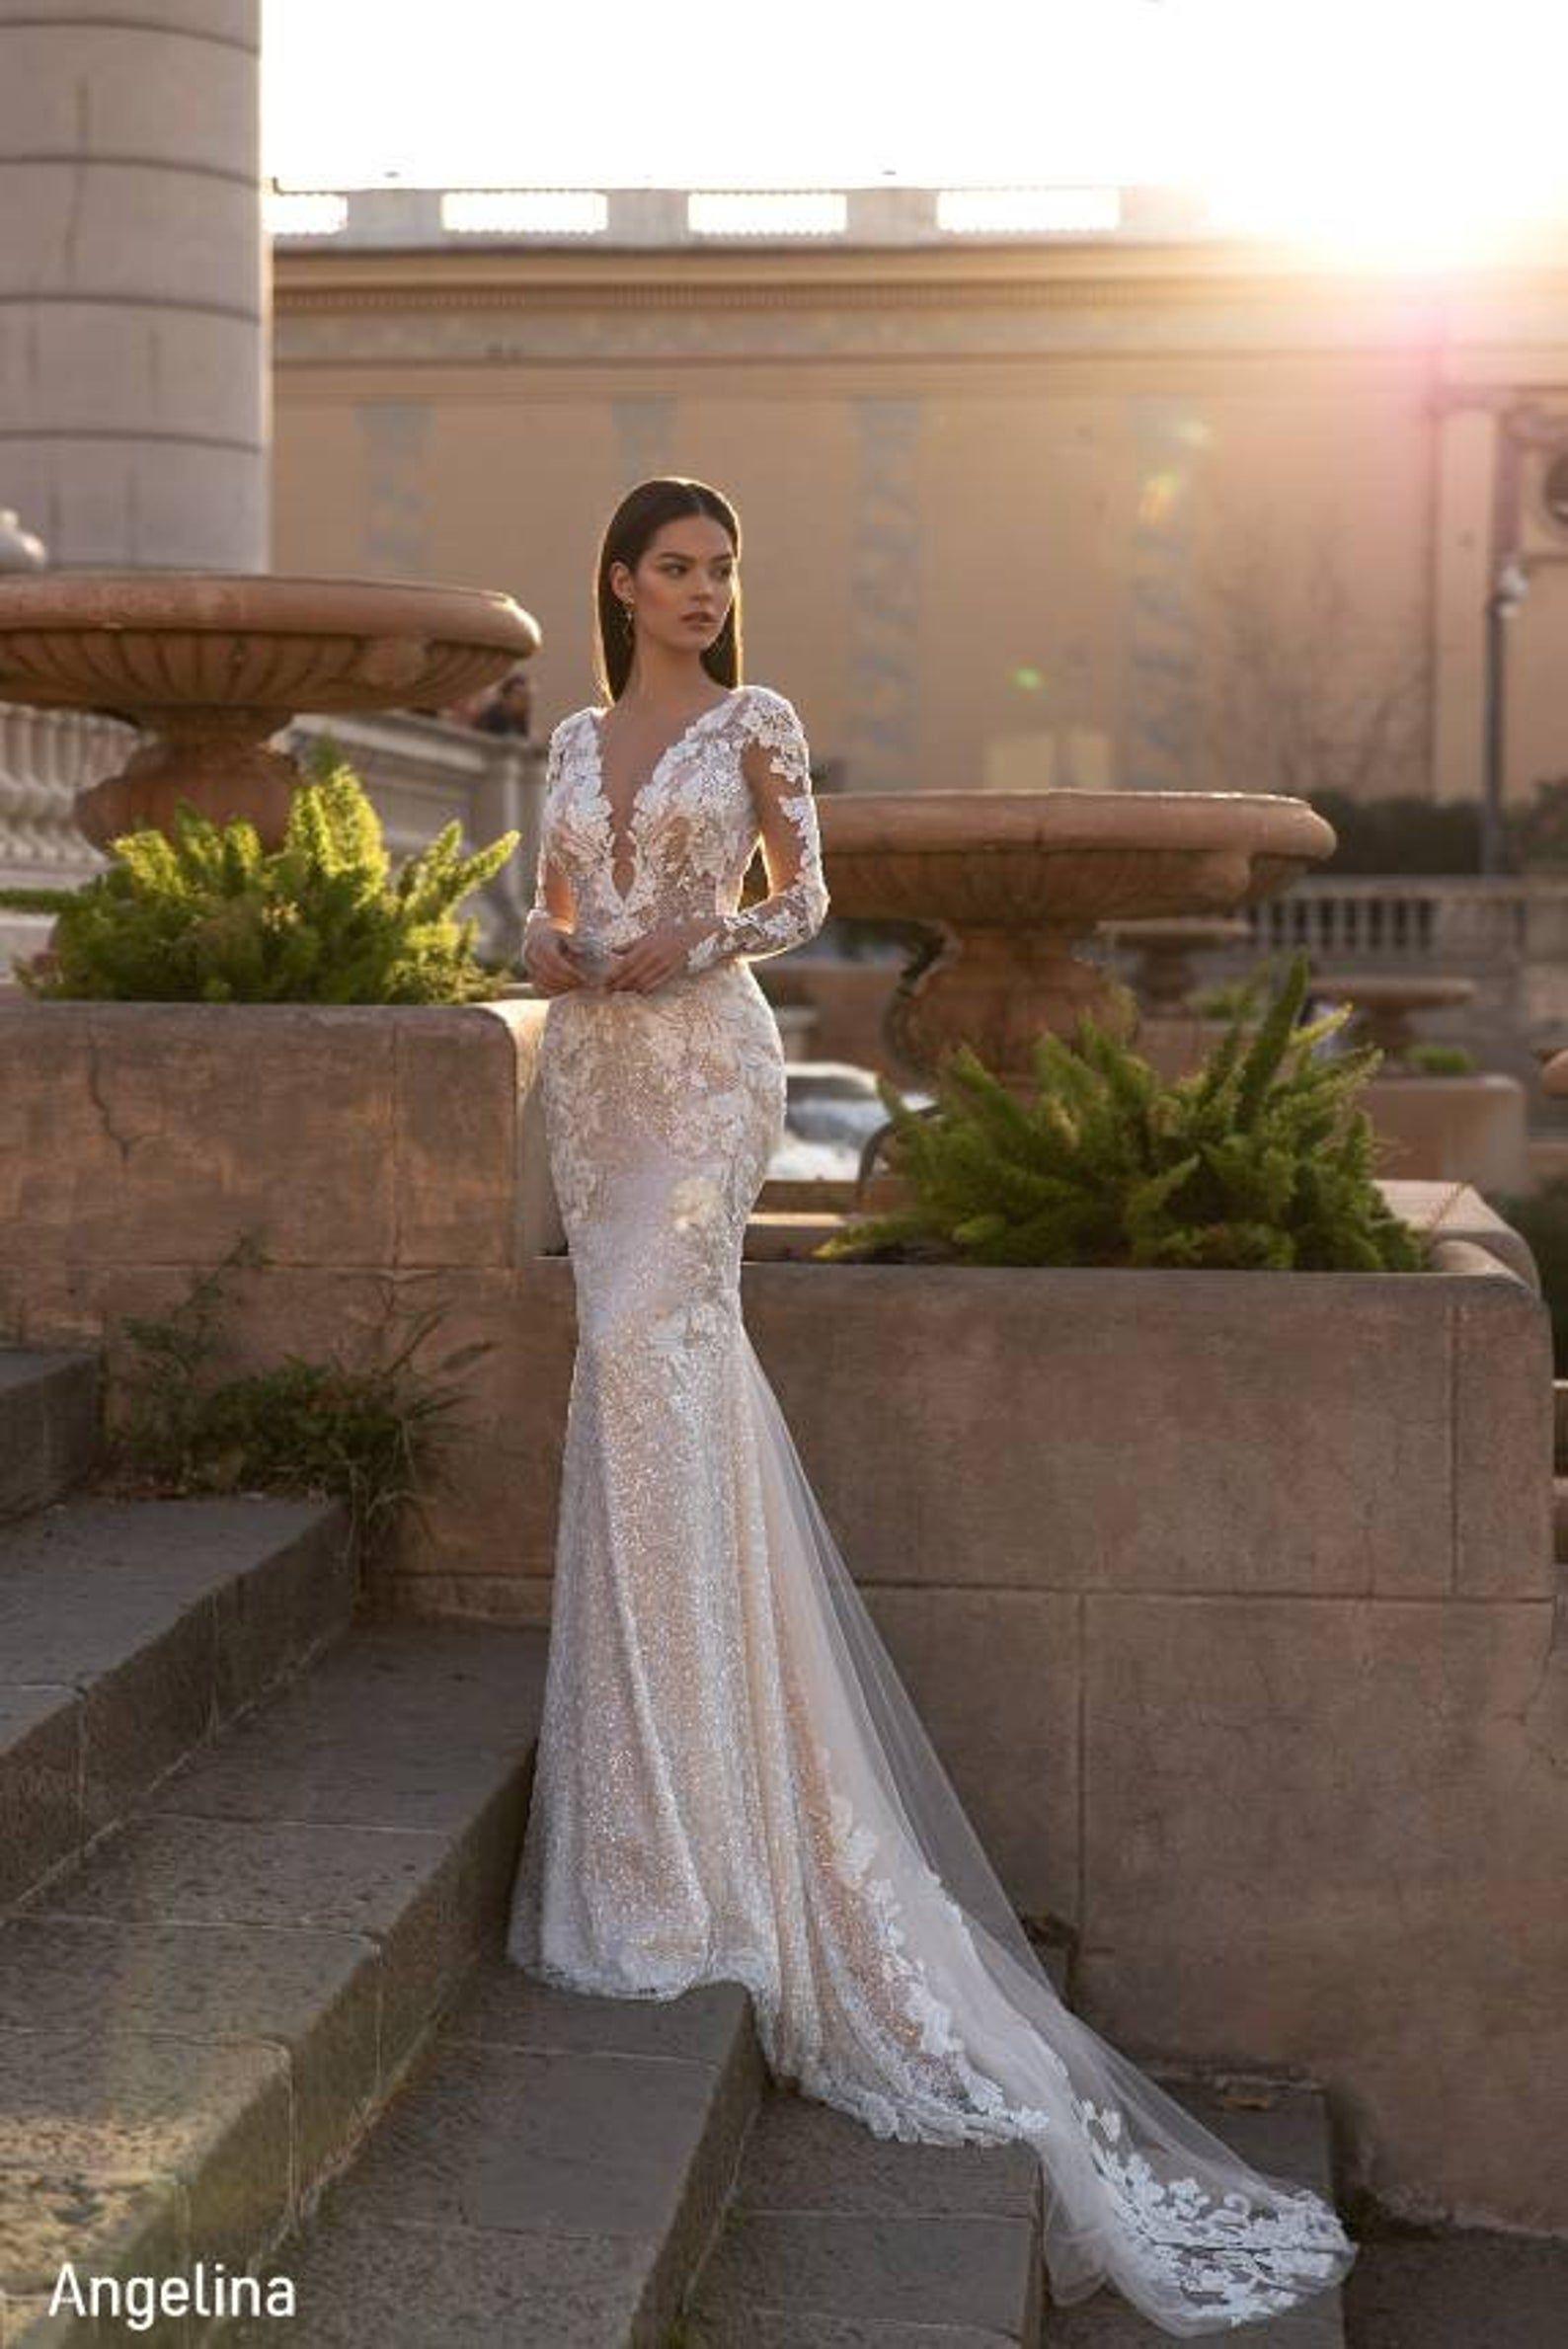 Mermaid Wedding Dress Wedding Dress Fitted Elegant Wedding Dress Long Sleeve Silhouette Wedding Dress Fully Beaded Wedding Dress In 2021 Fitted Wedding Dress Mermaid Wedding Dress Long Sleeve Wedding Dress Lace [ 2379 x 1588 Pixel ]